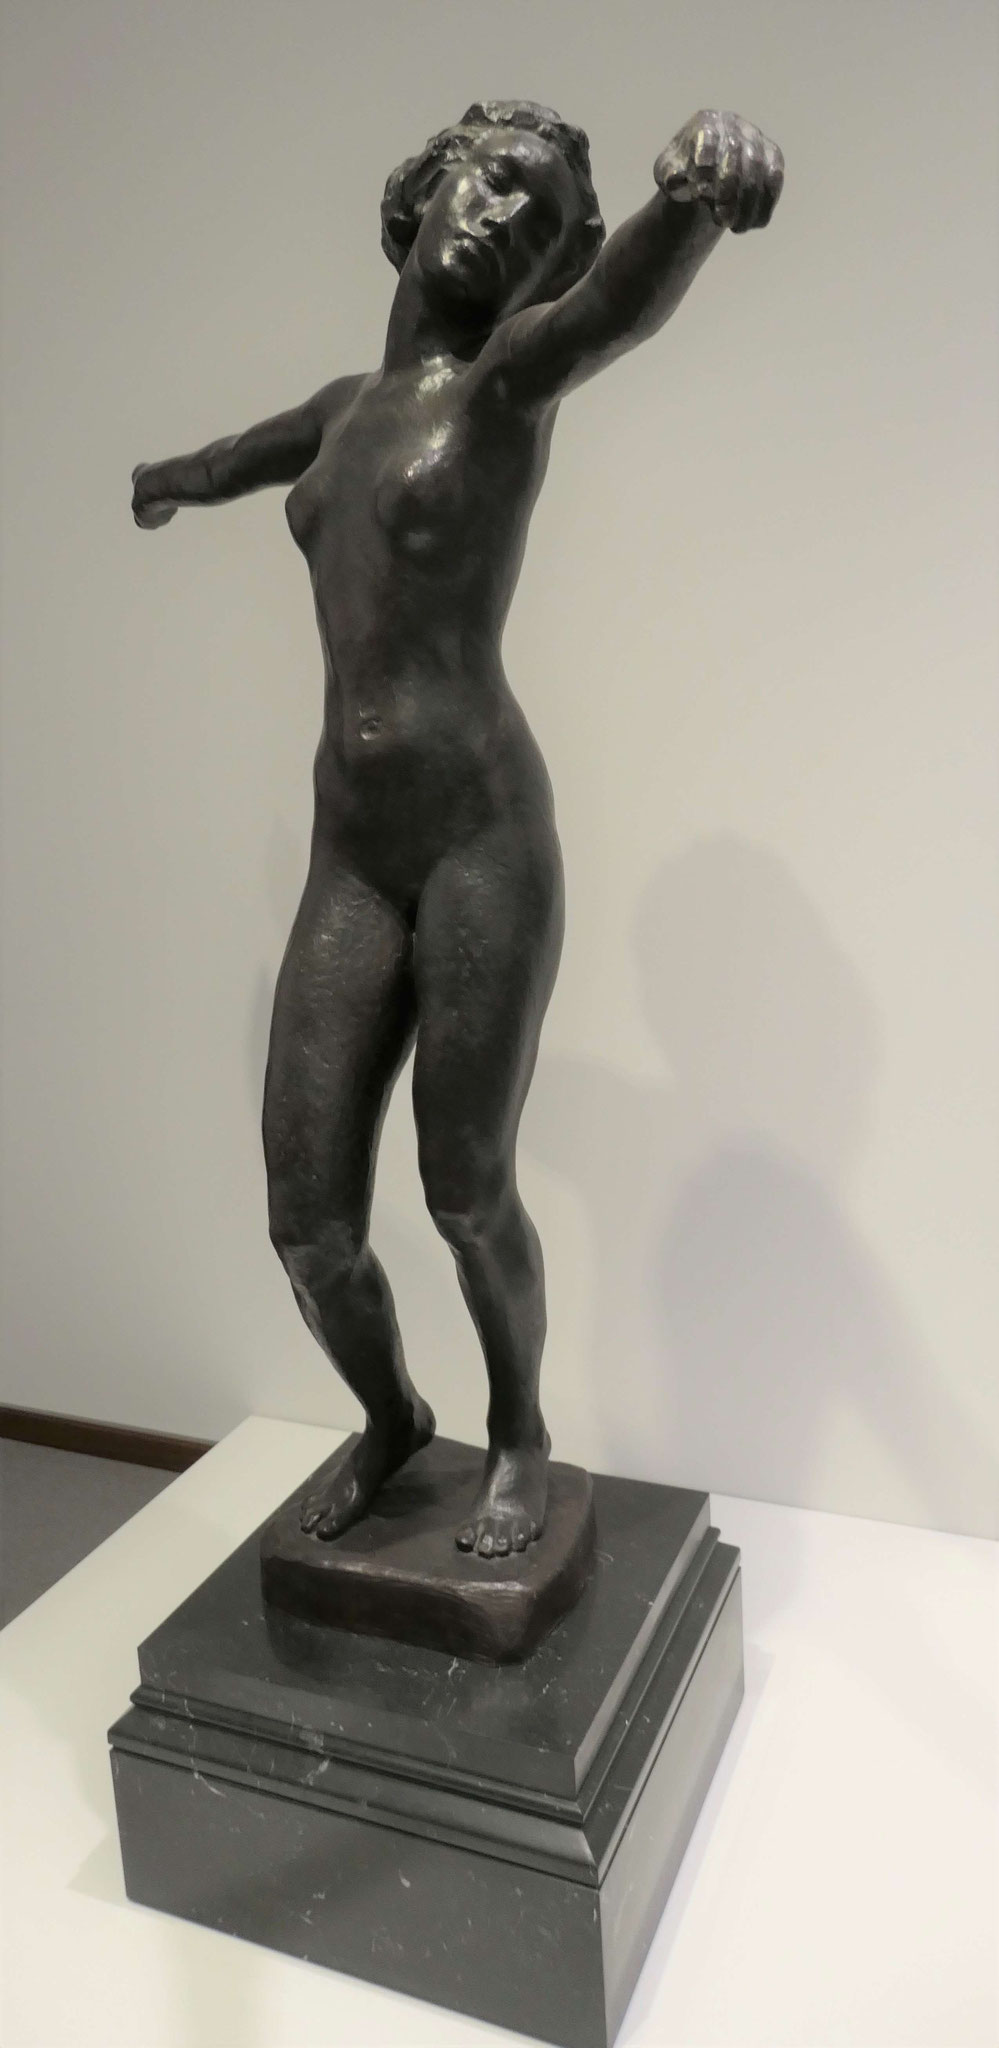 Georg Kolbe, Tänzerin, 1911/12, Neue Nationalgalerie Berlin